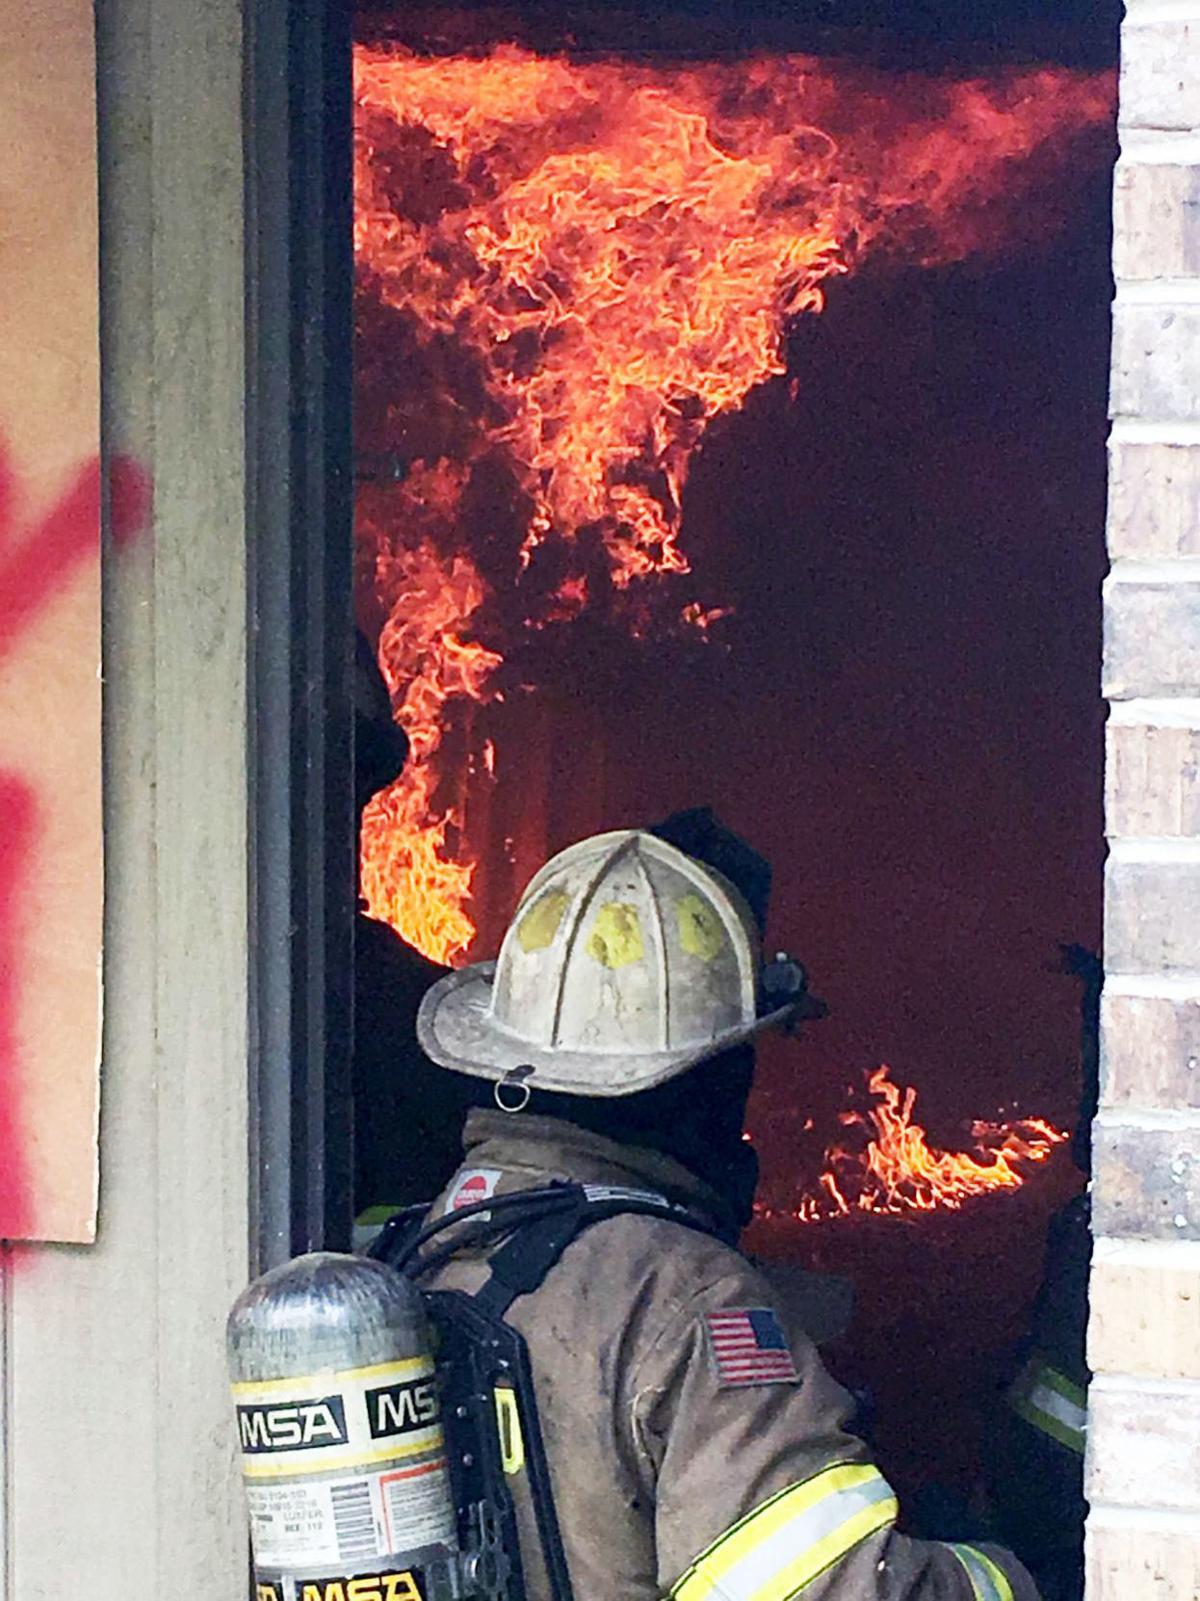 fireman entering